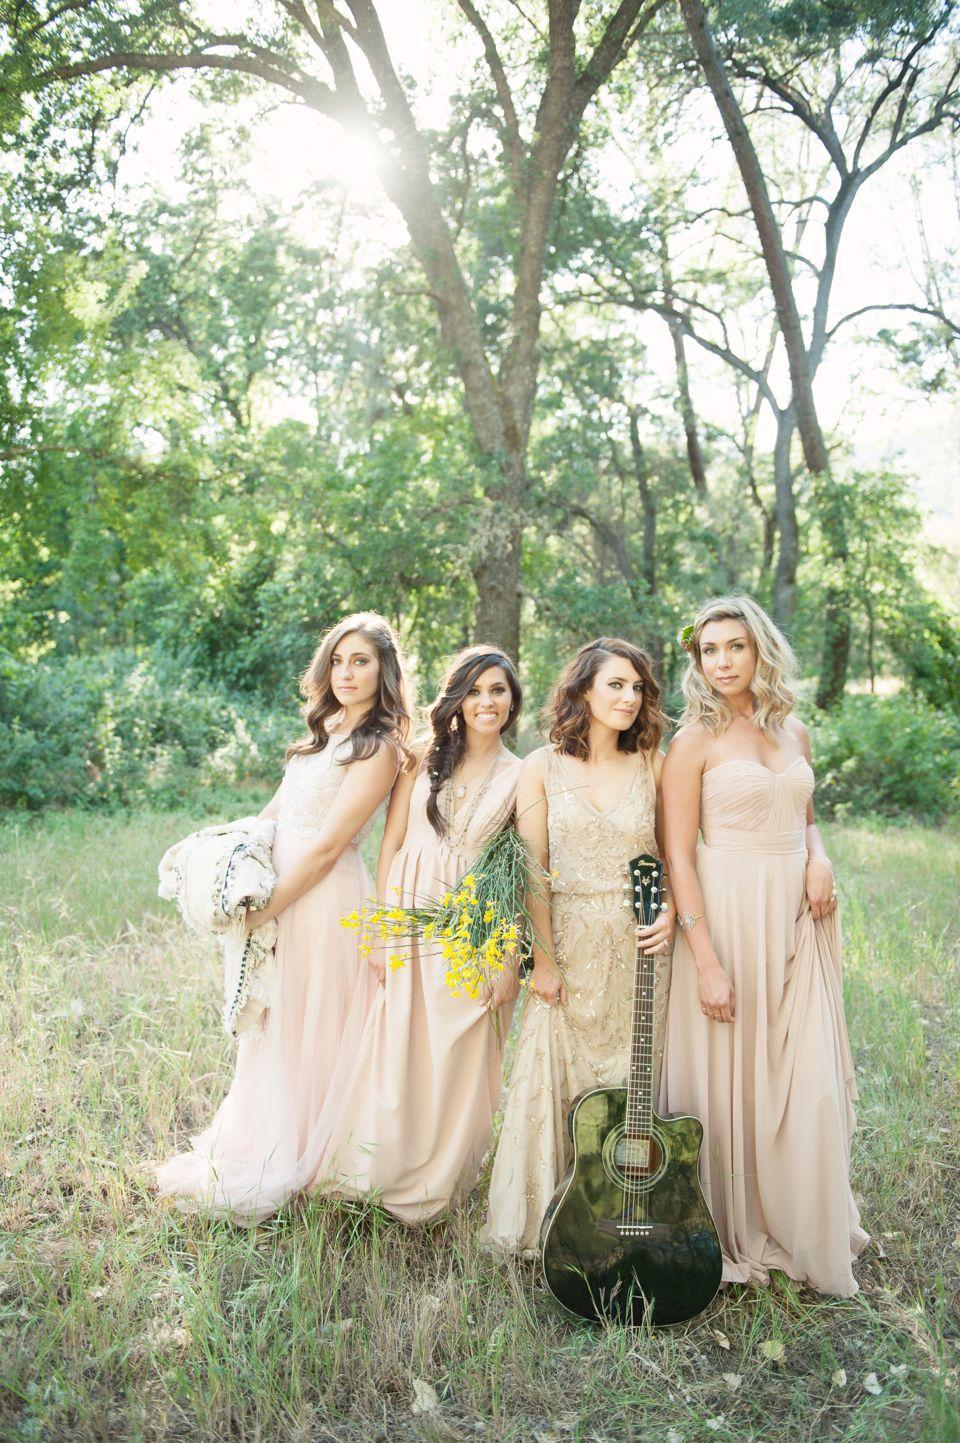 BHLDN Bridesmaid Dresses